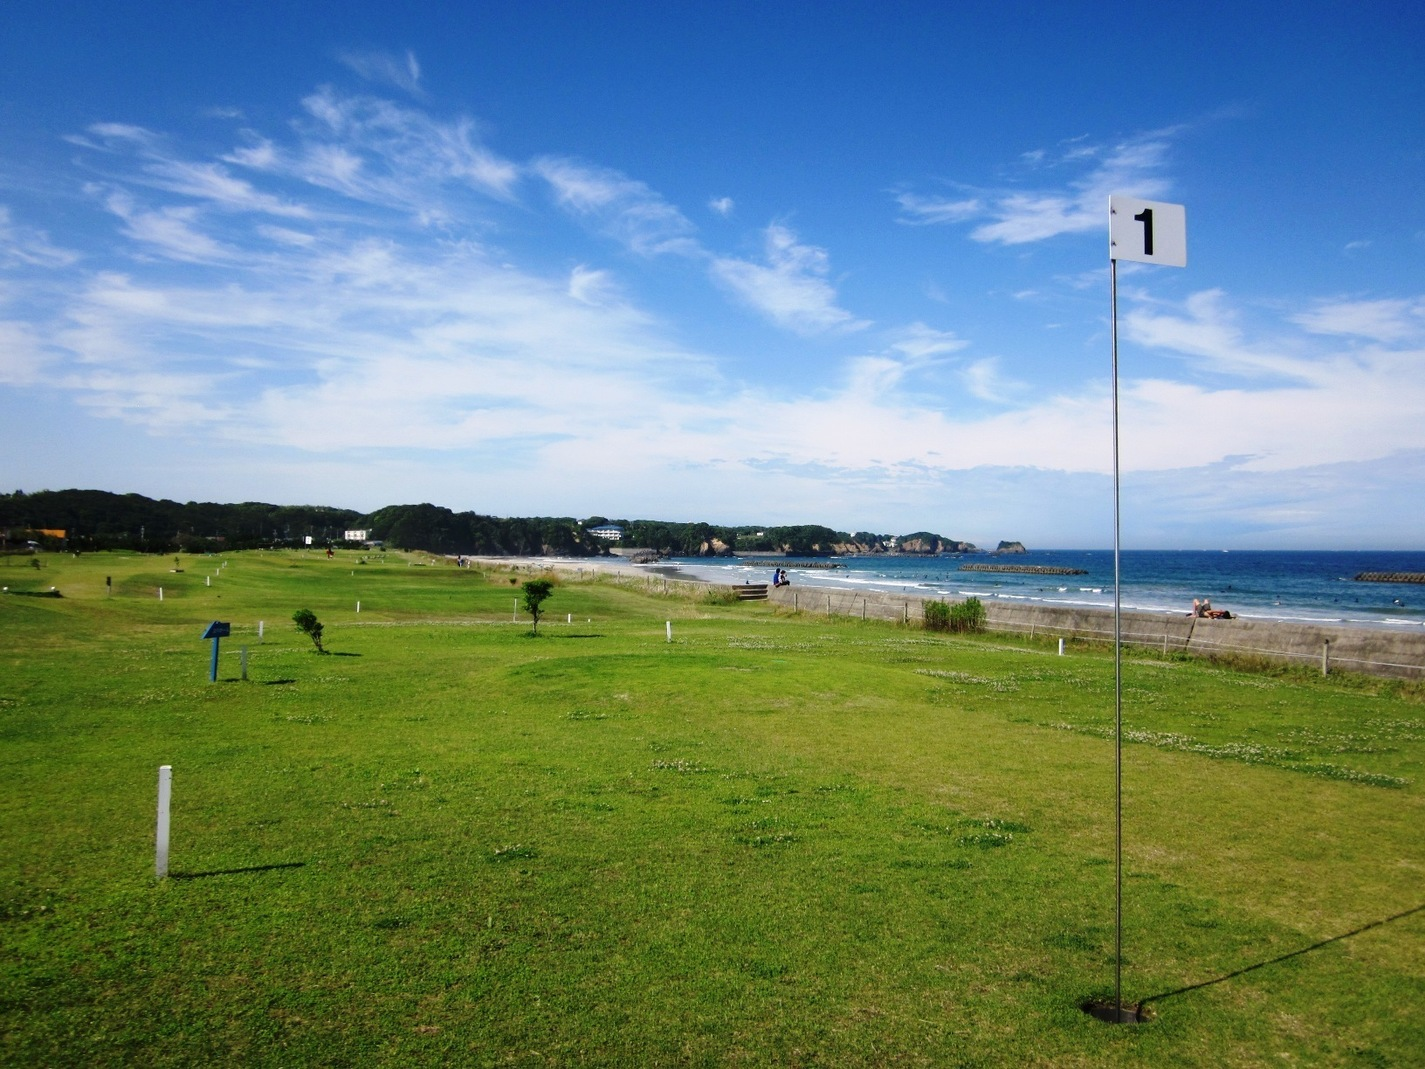 Shima park golf course